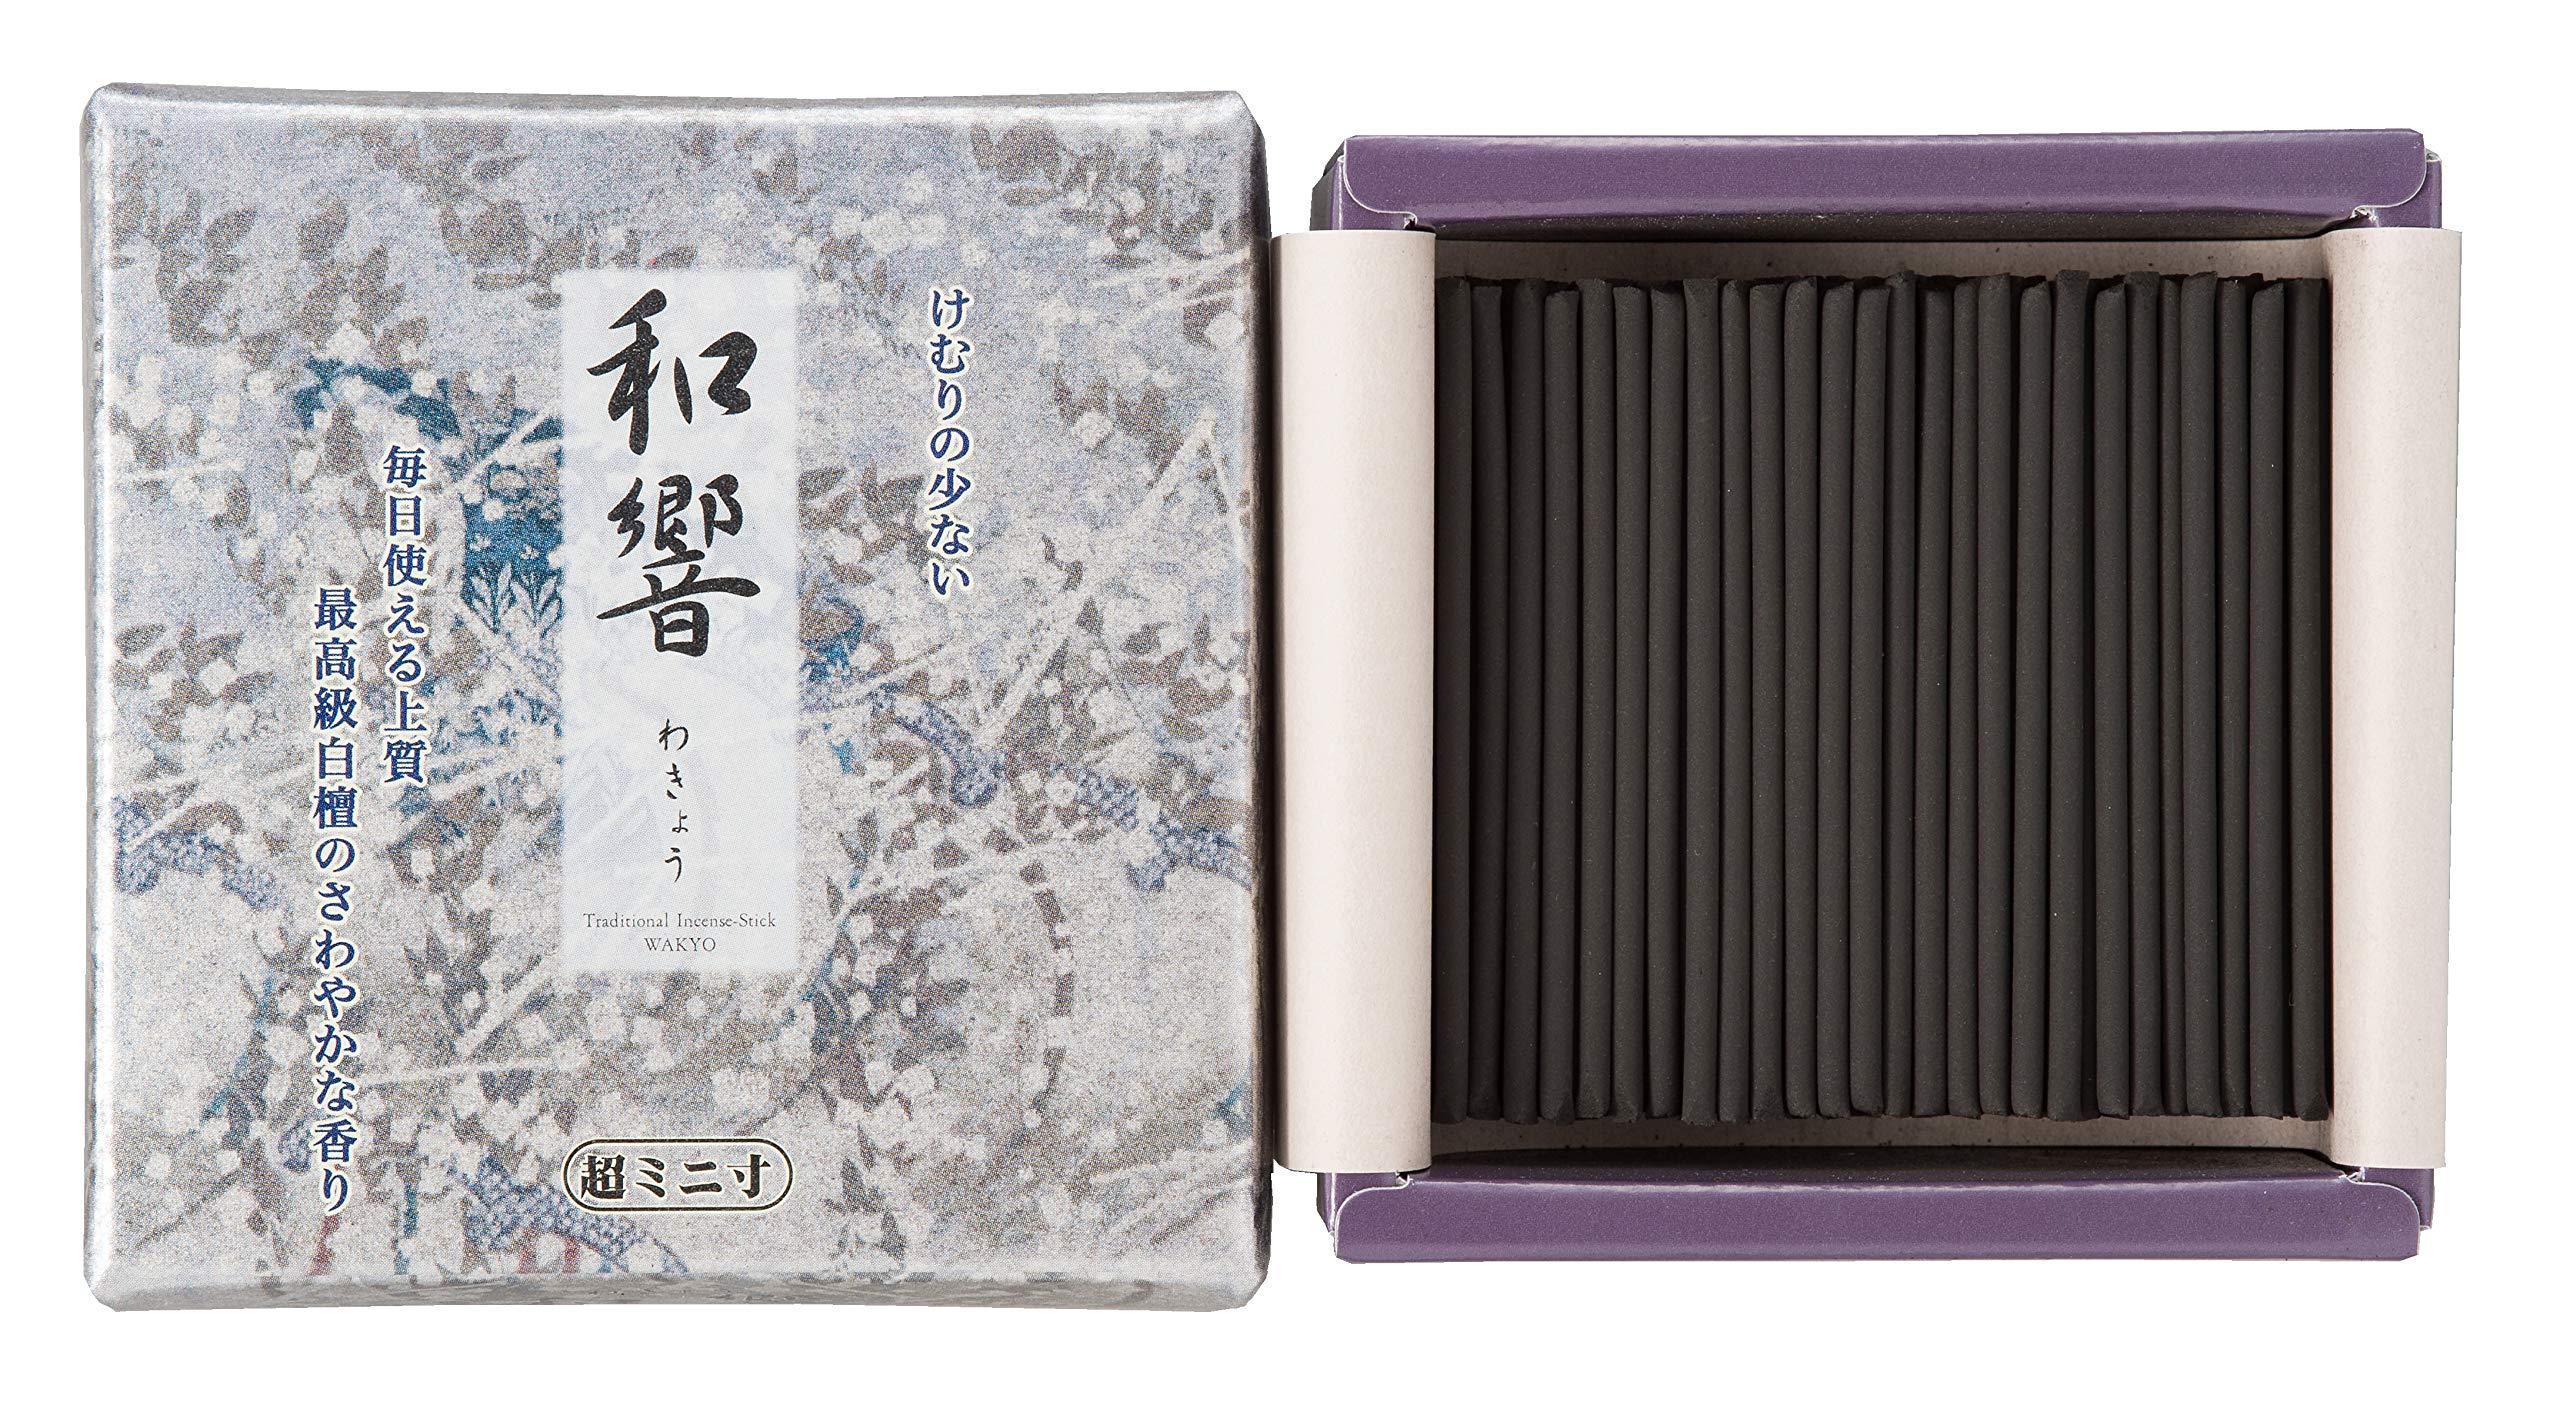 Shorindo Japanese Sandalwood Incense Sticks Wakyo Less Smoke Type Mini Short Sticks - 2.4 inches 195 Sticks - Made in Japan